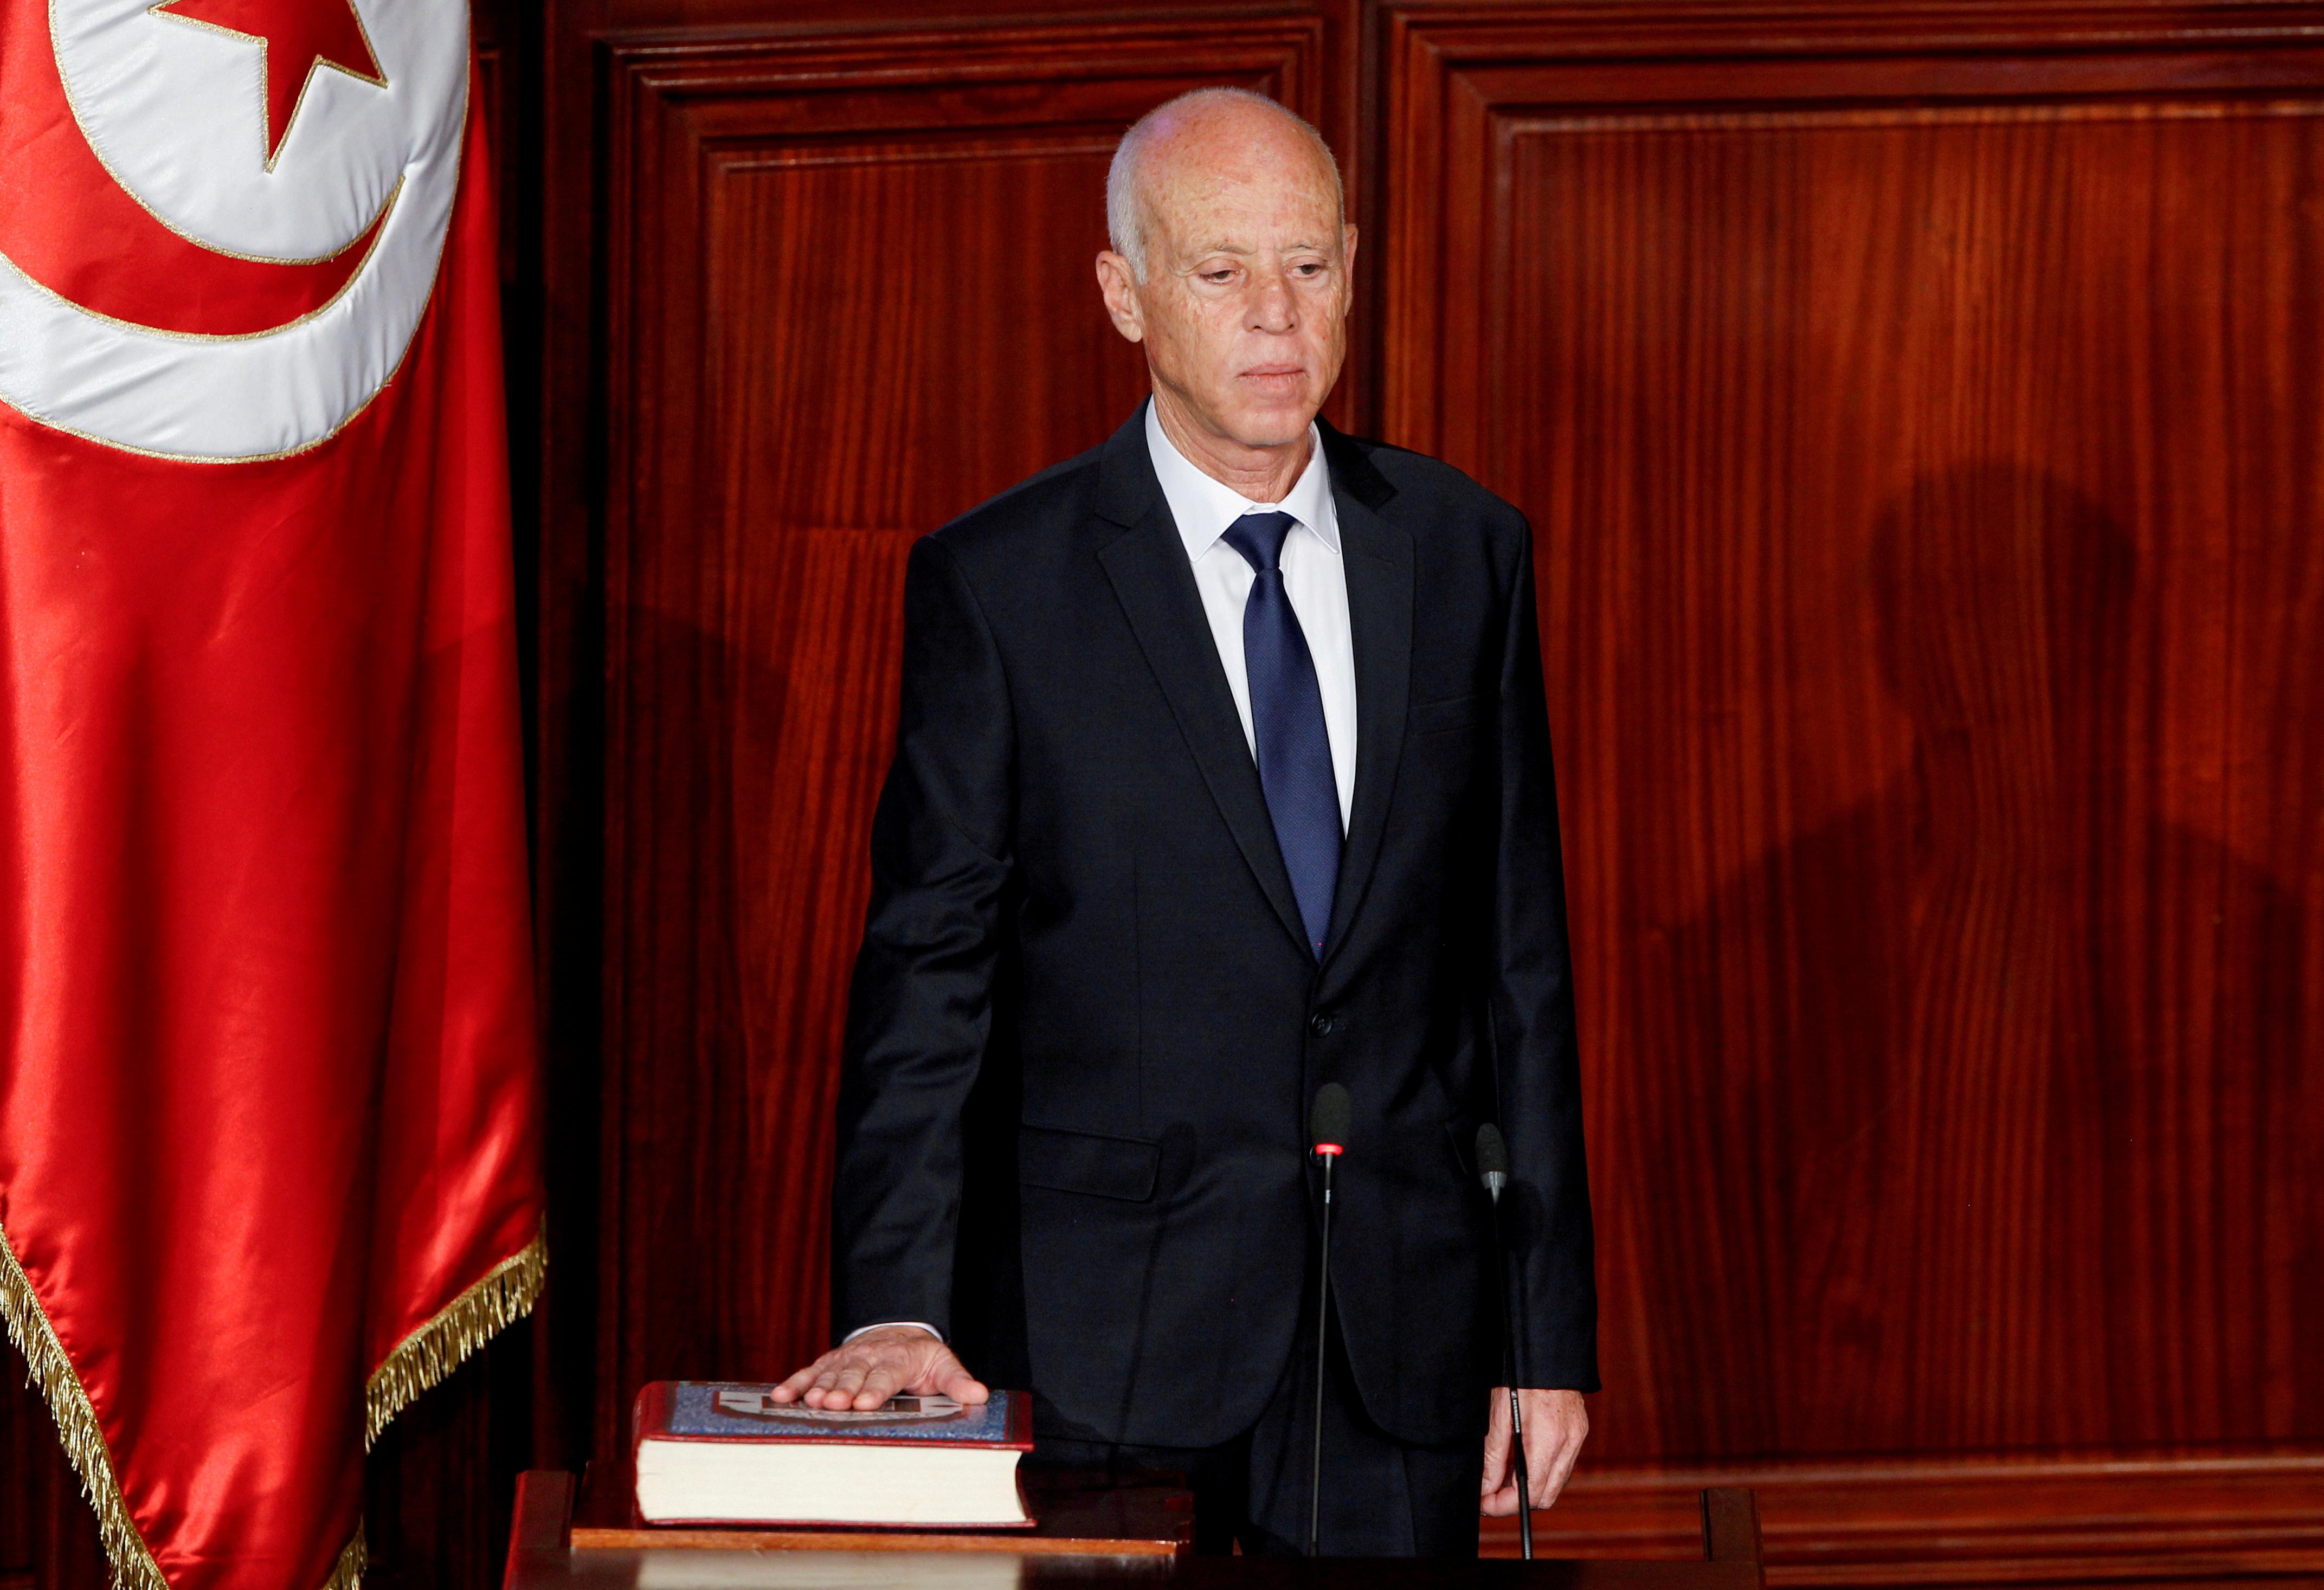 Tunisian President Kais Saied takes the oath of office in Tunis, Tunisia, October 23, 2019. REUTERS/Zoubeir Souissi/File Photo